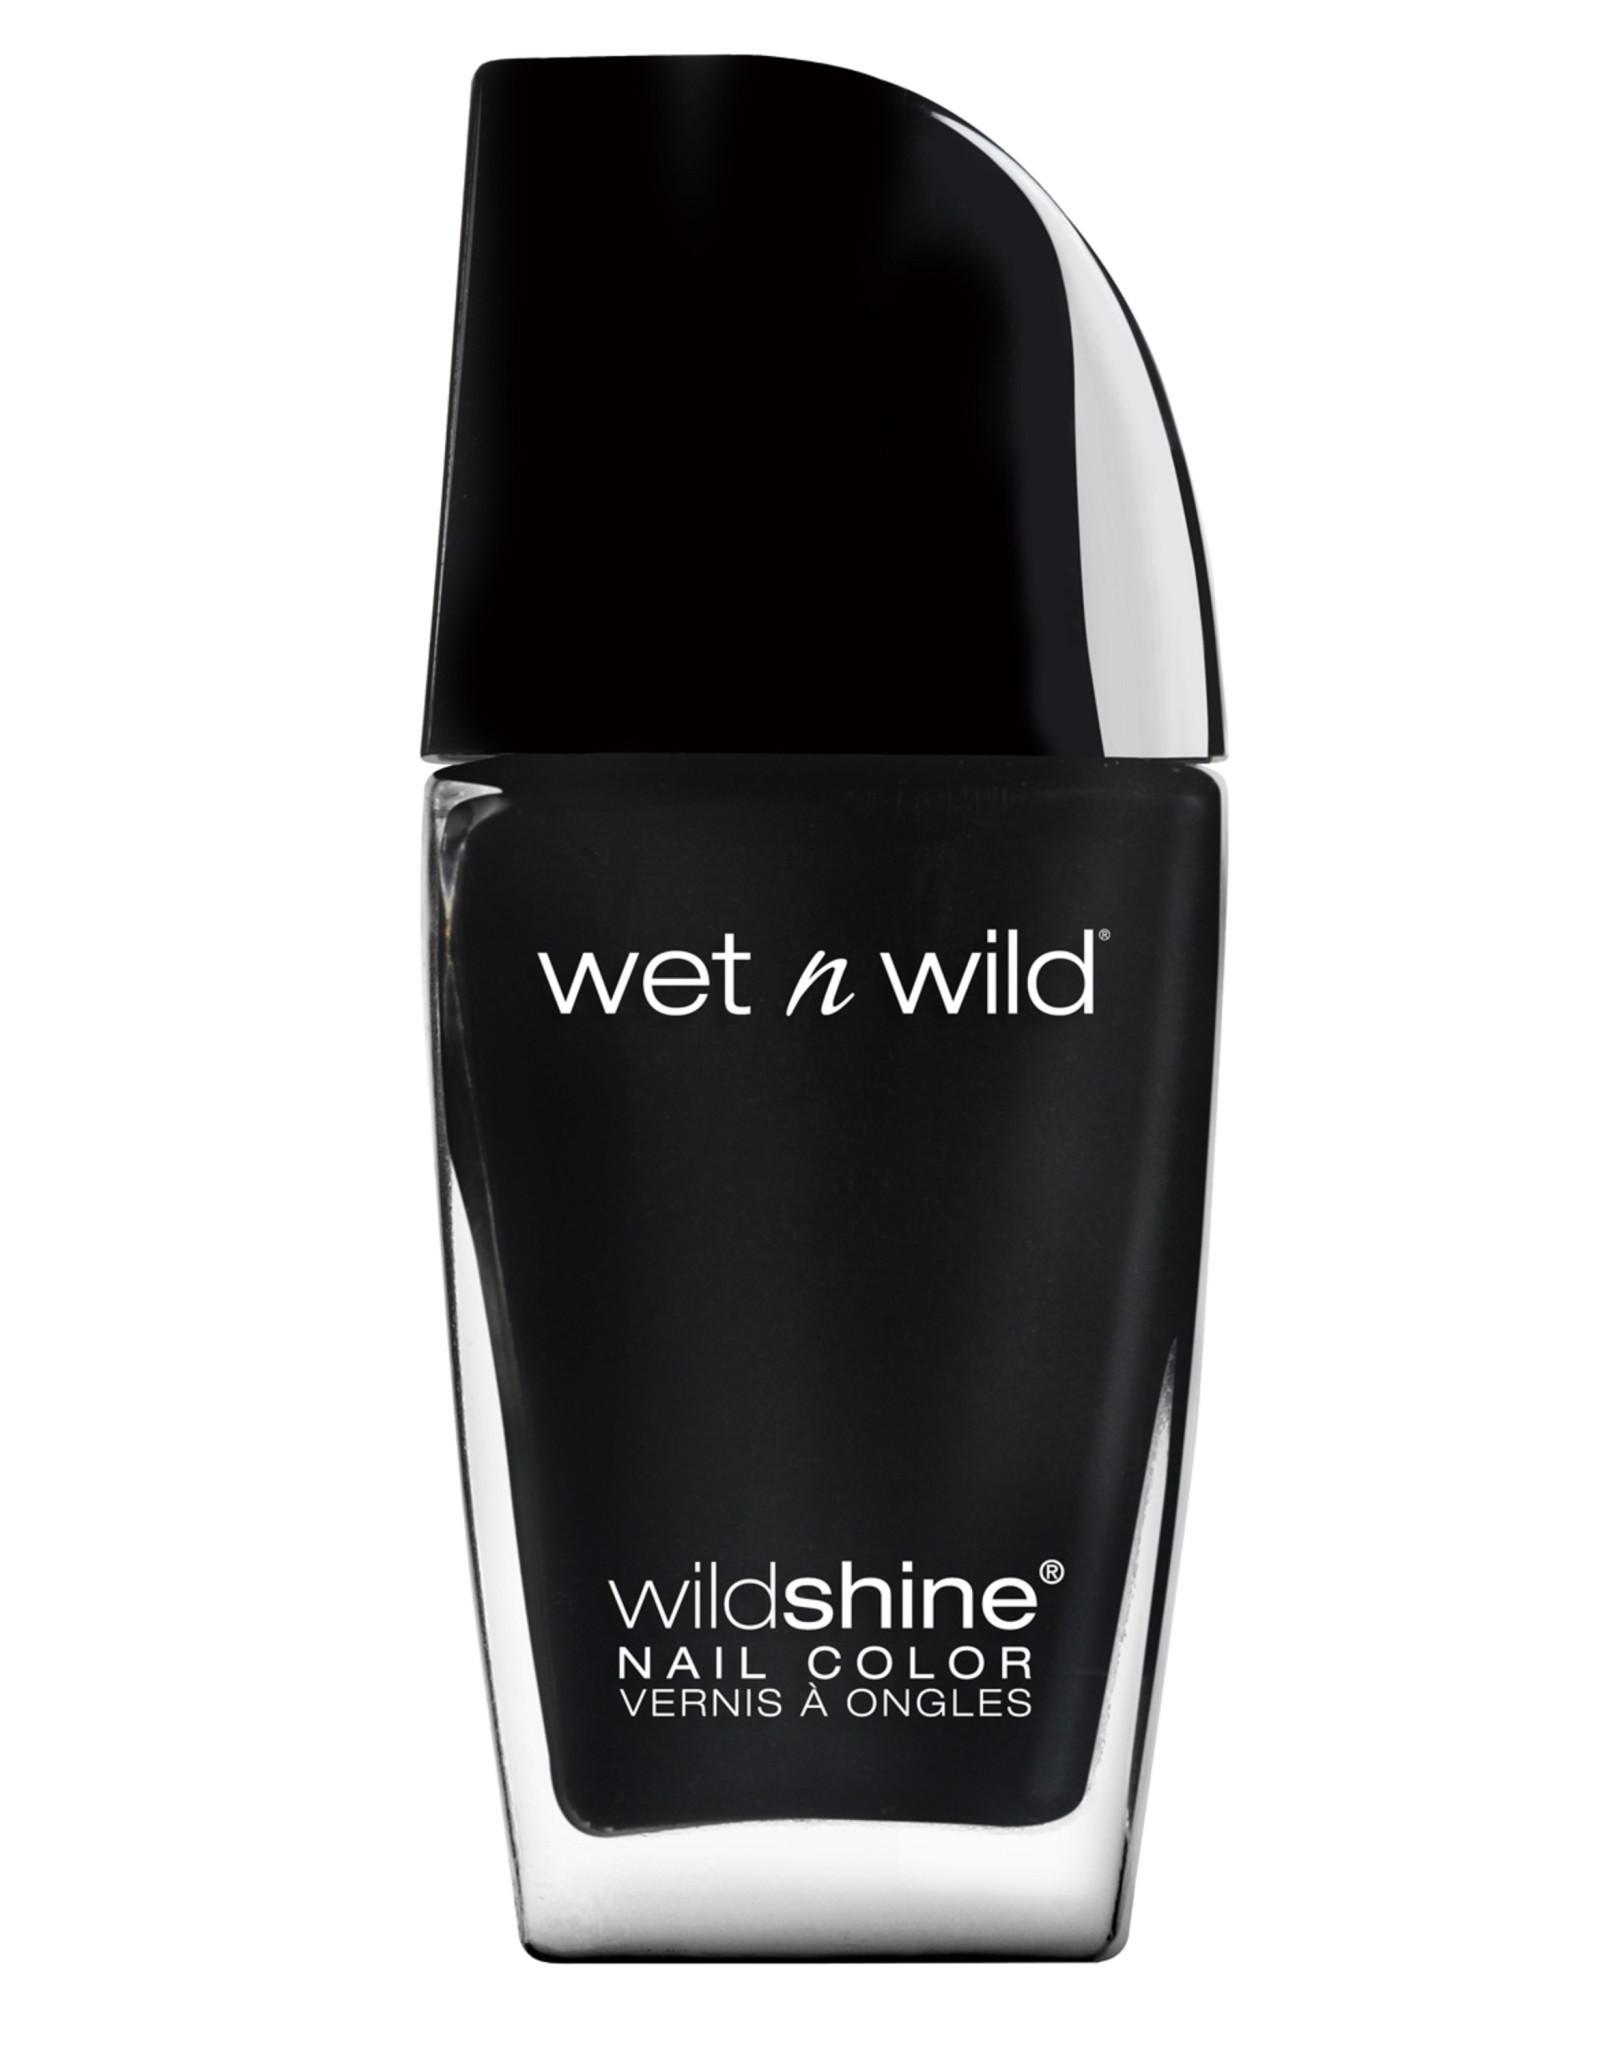 wet n wild Wild Shine Nail Color, Black Crème